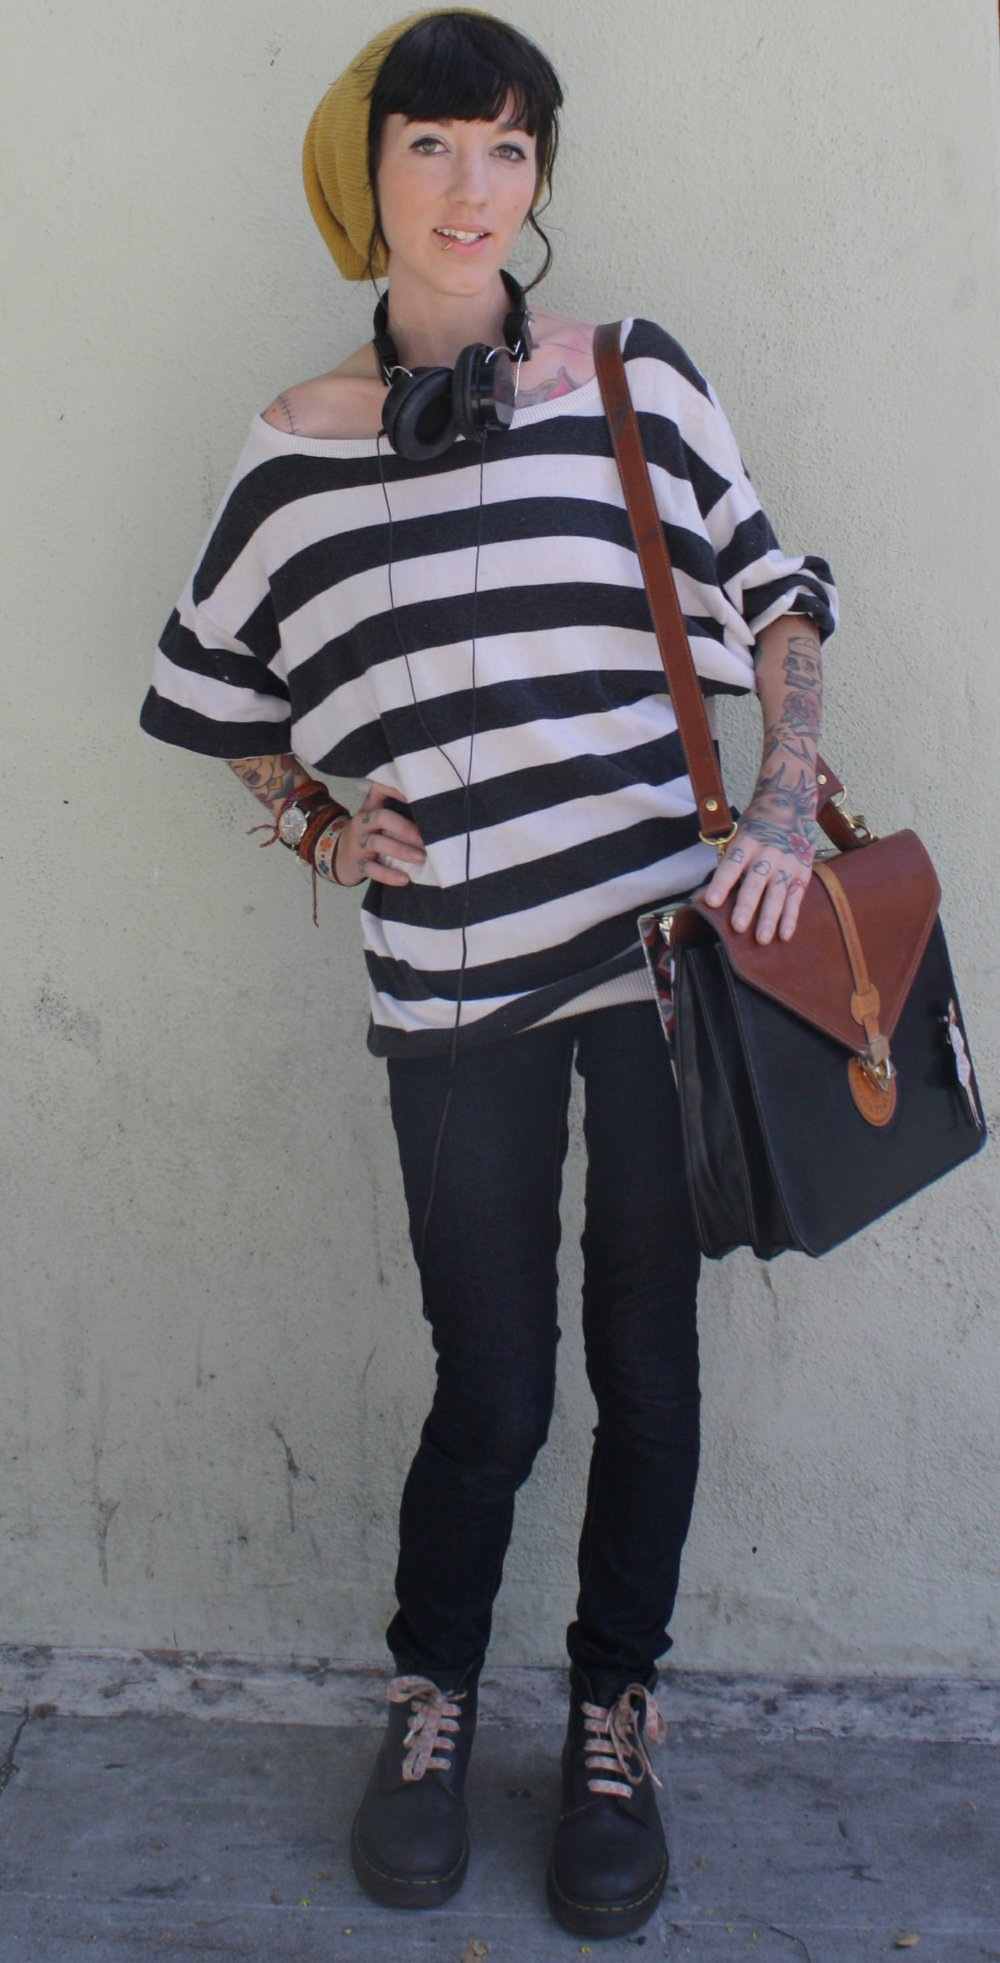 Leah Shoemaker